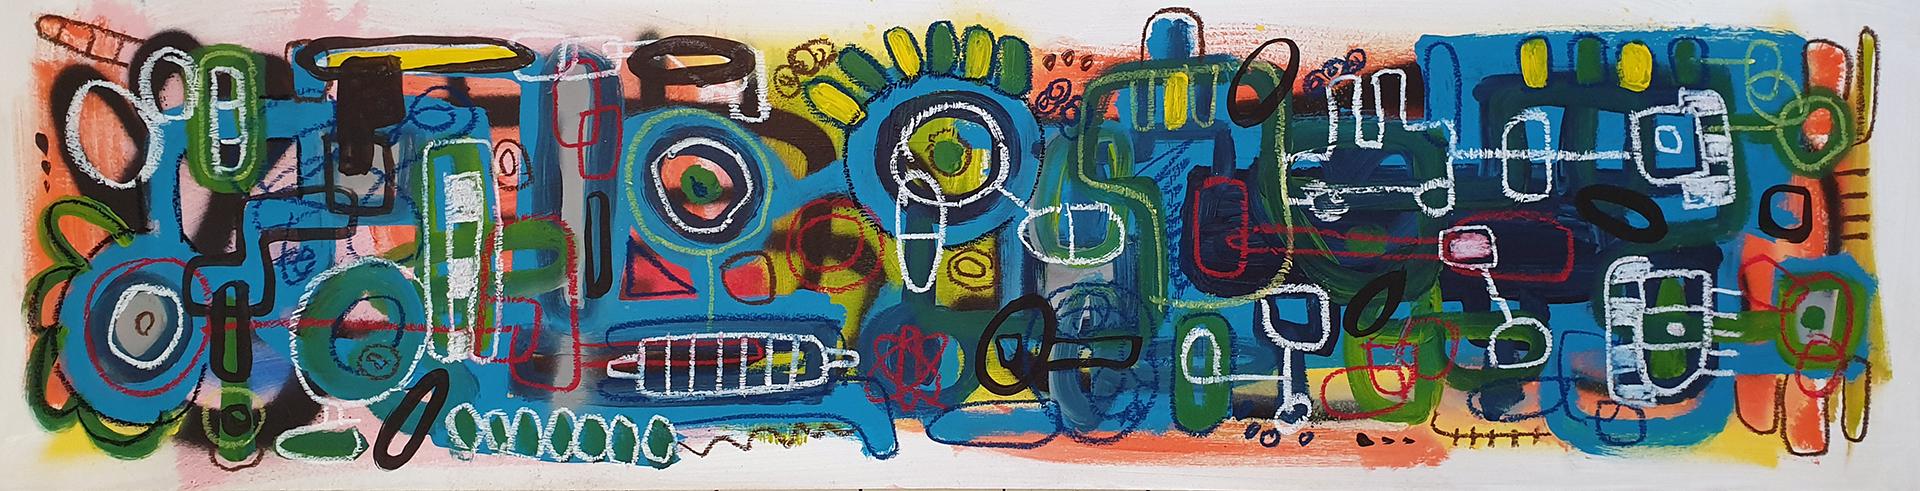 Novak-IISHOO-Contemporary-Art-20101401-DVNV1-David-Novak-2009-0026